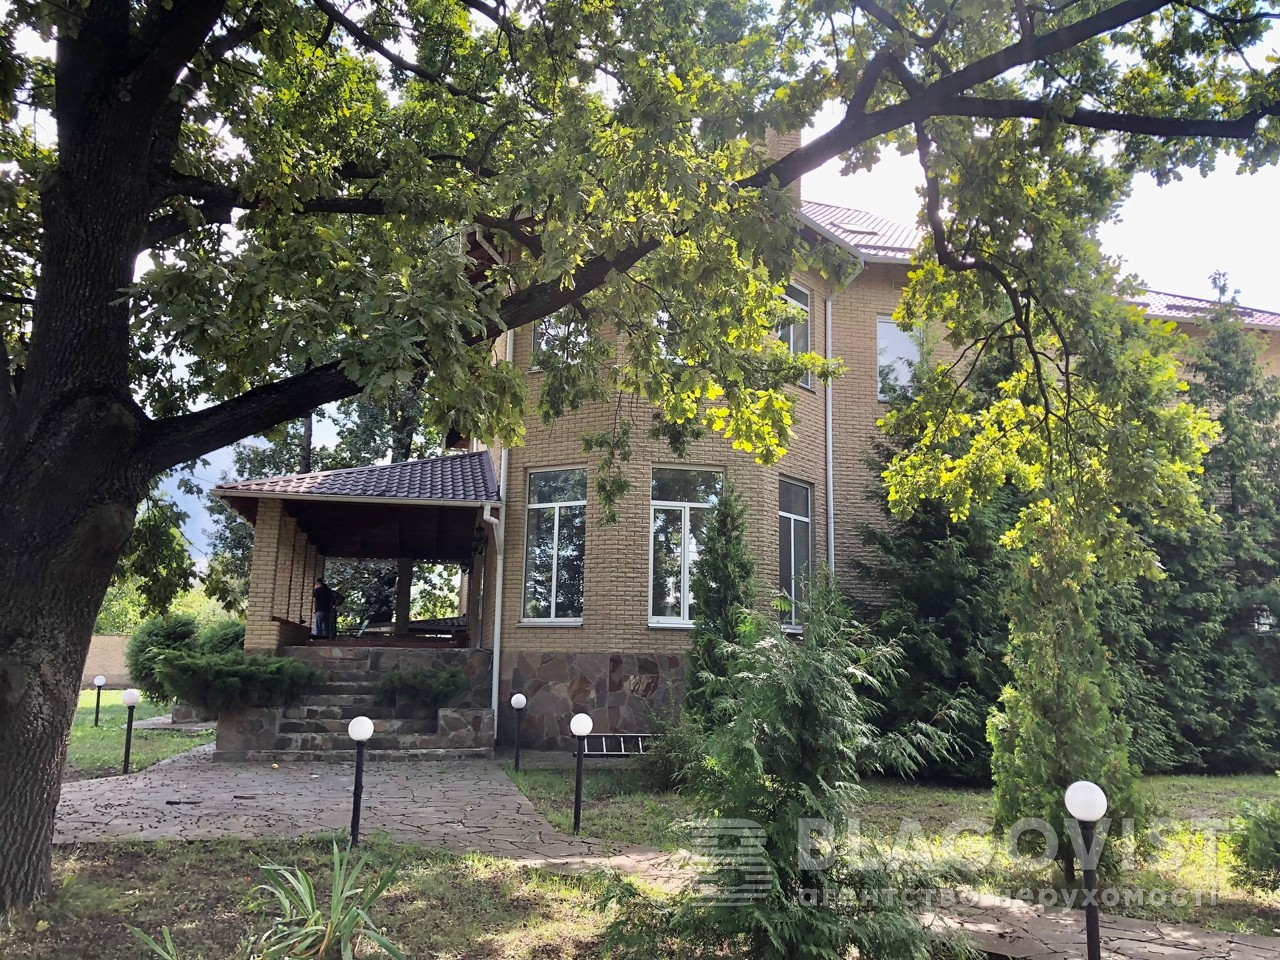 Квартира C-109815, Клавдии Радченко, 14, Киев - Фото 16